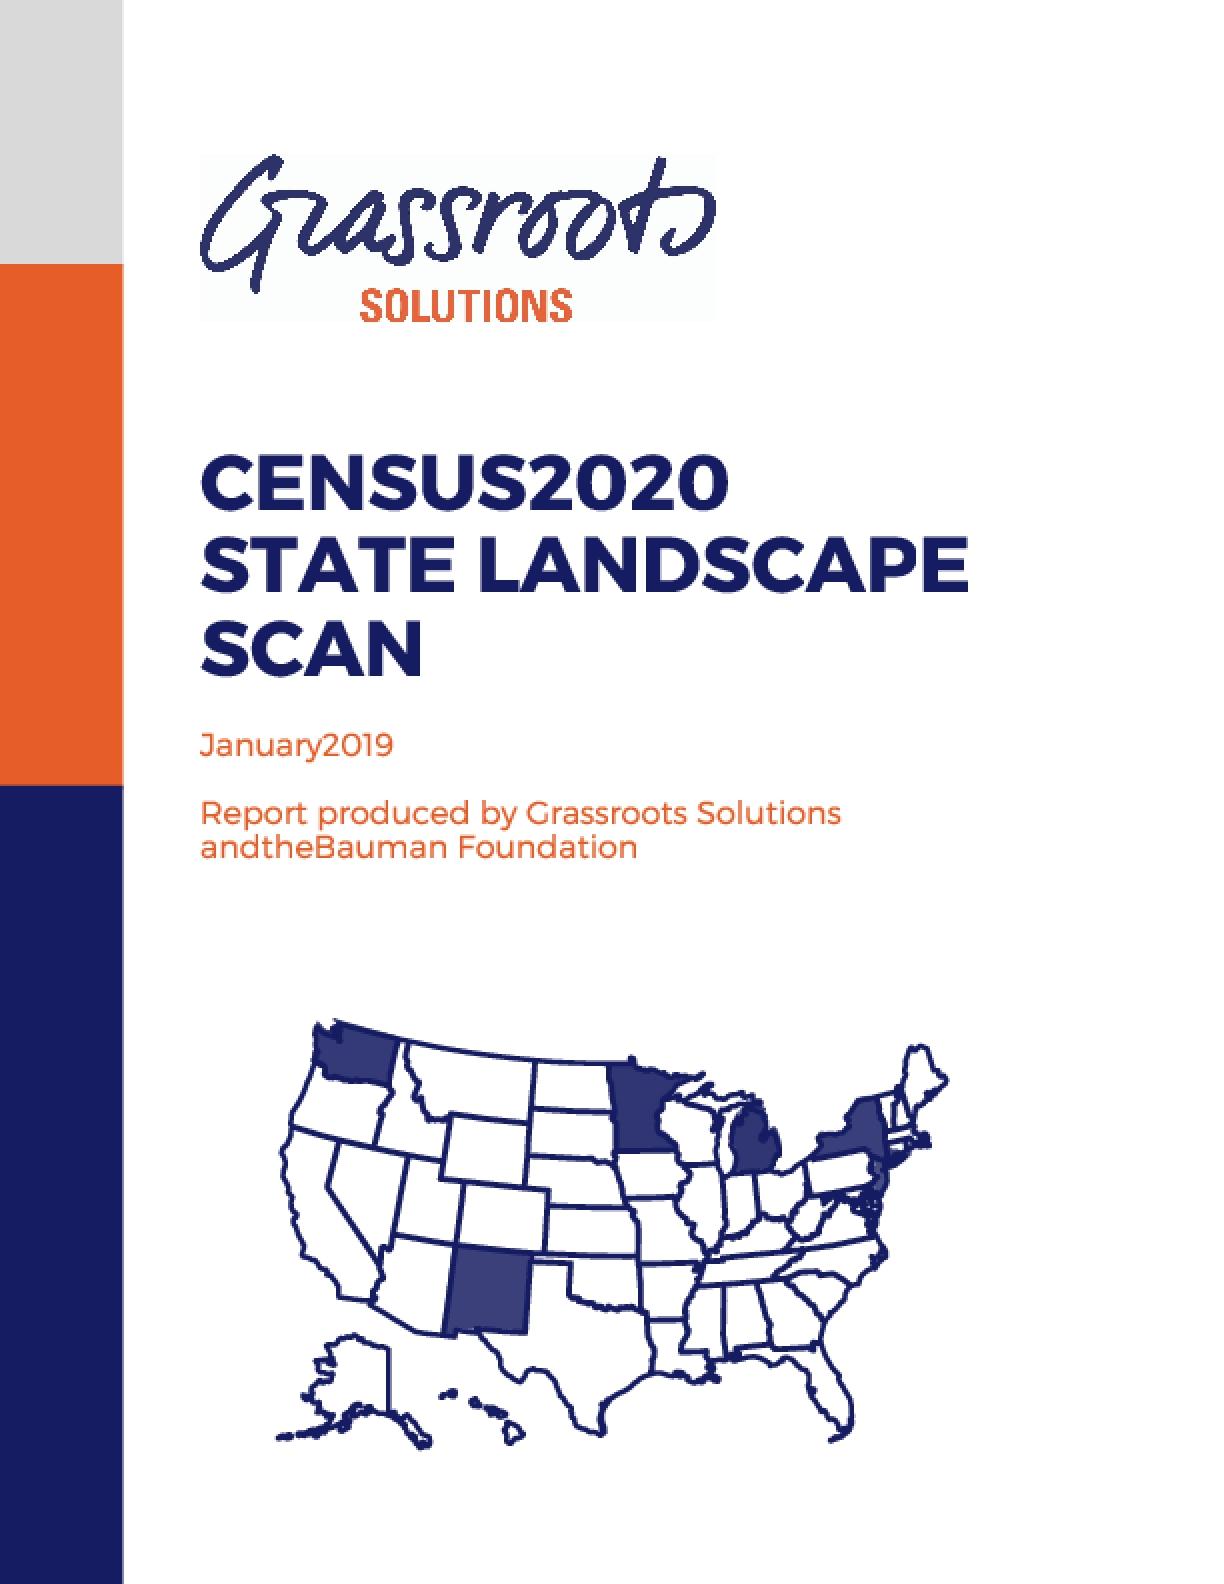 Census 2020 State Landscape Scan